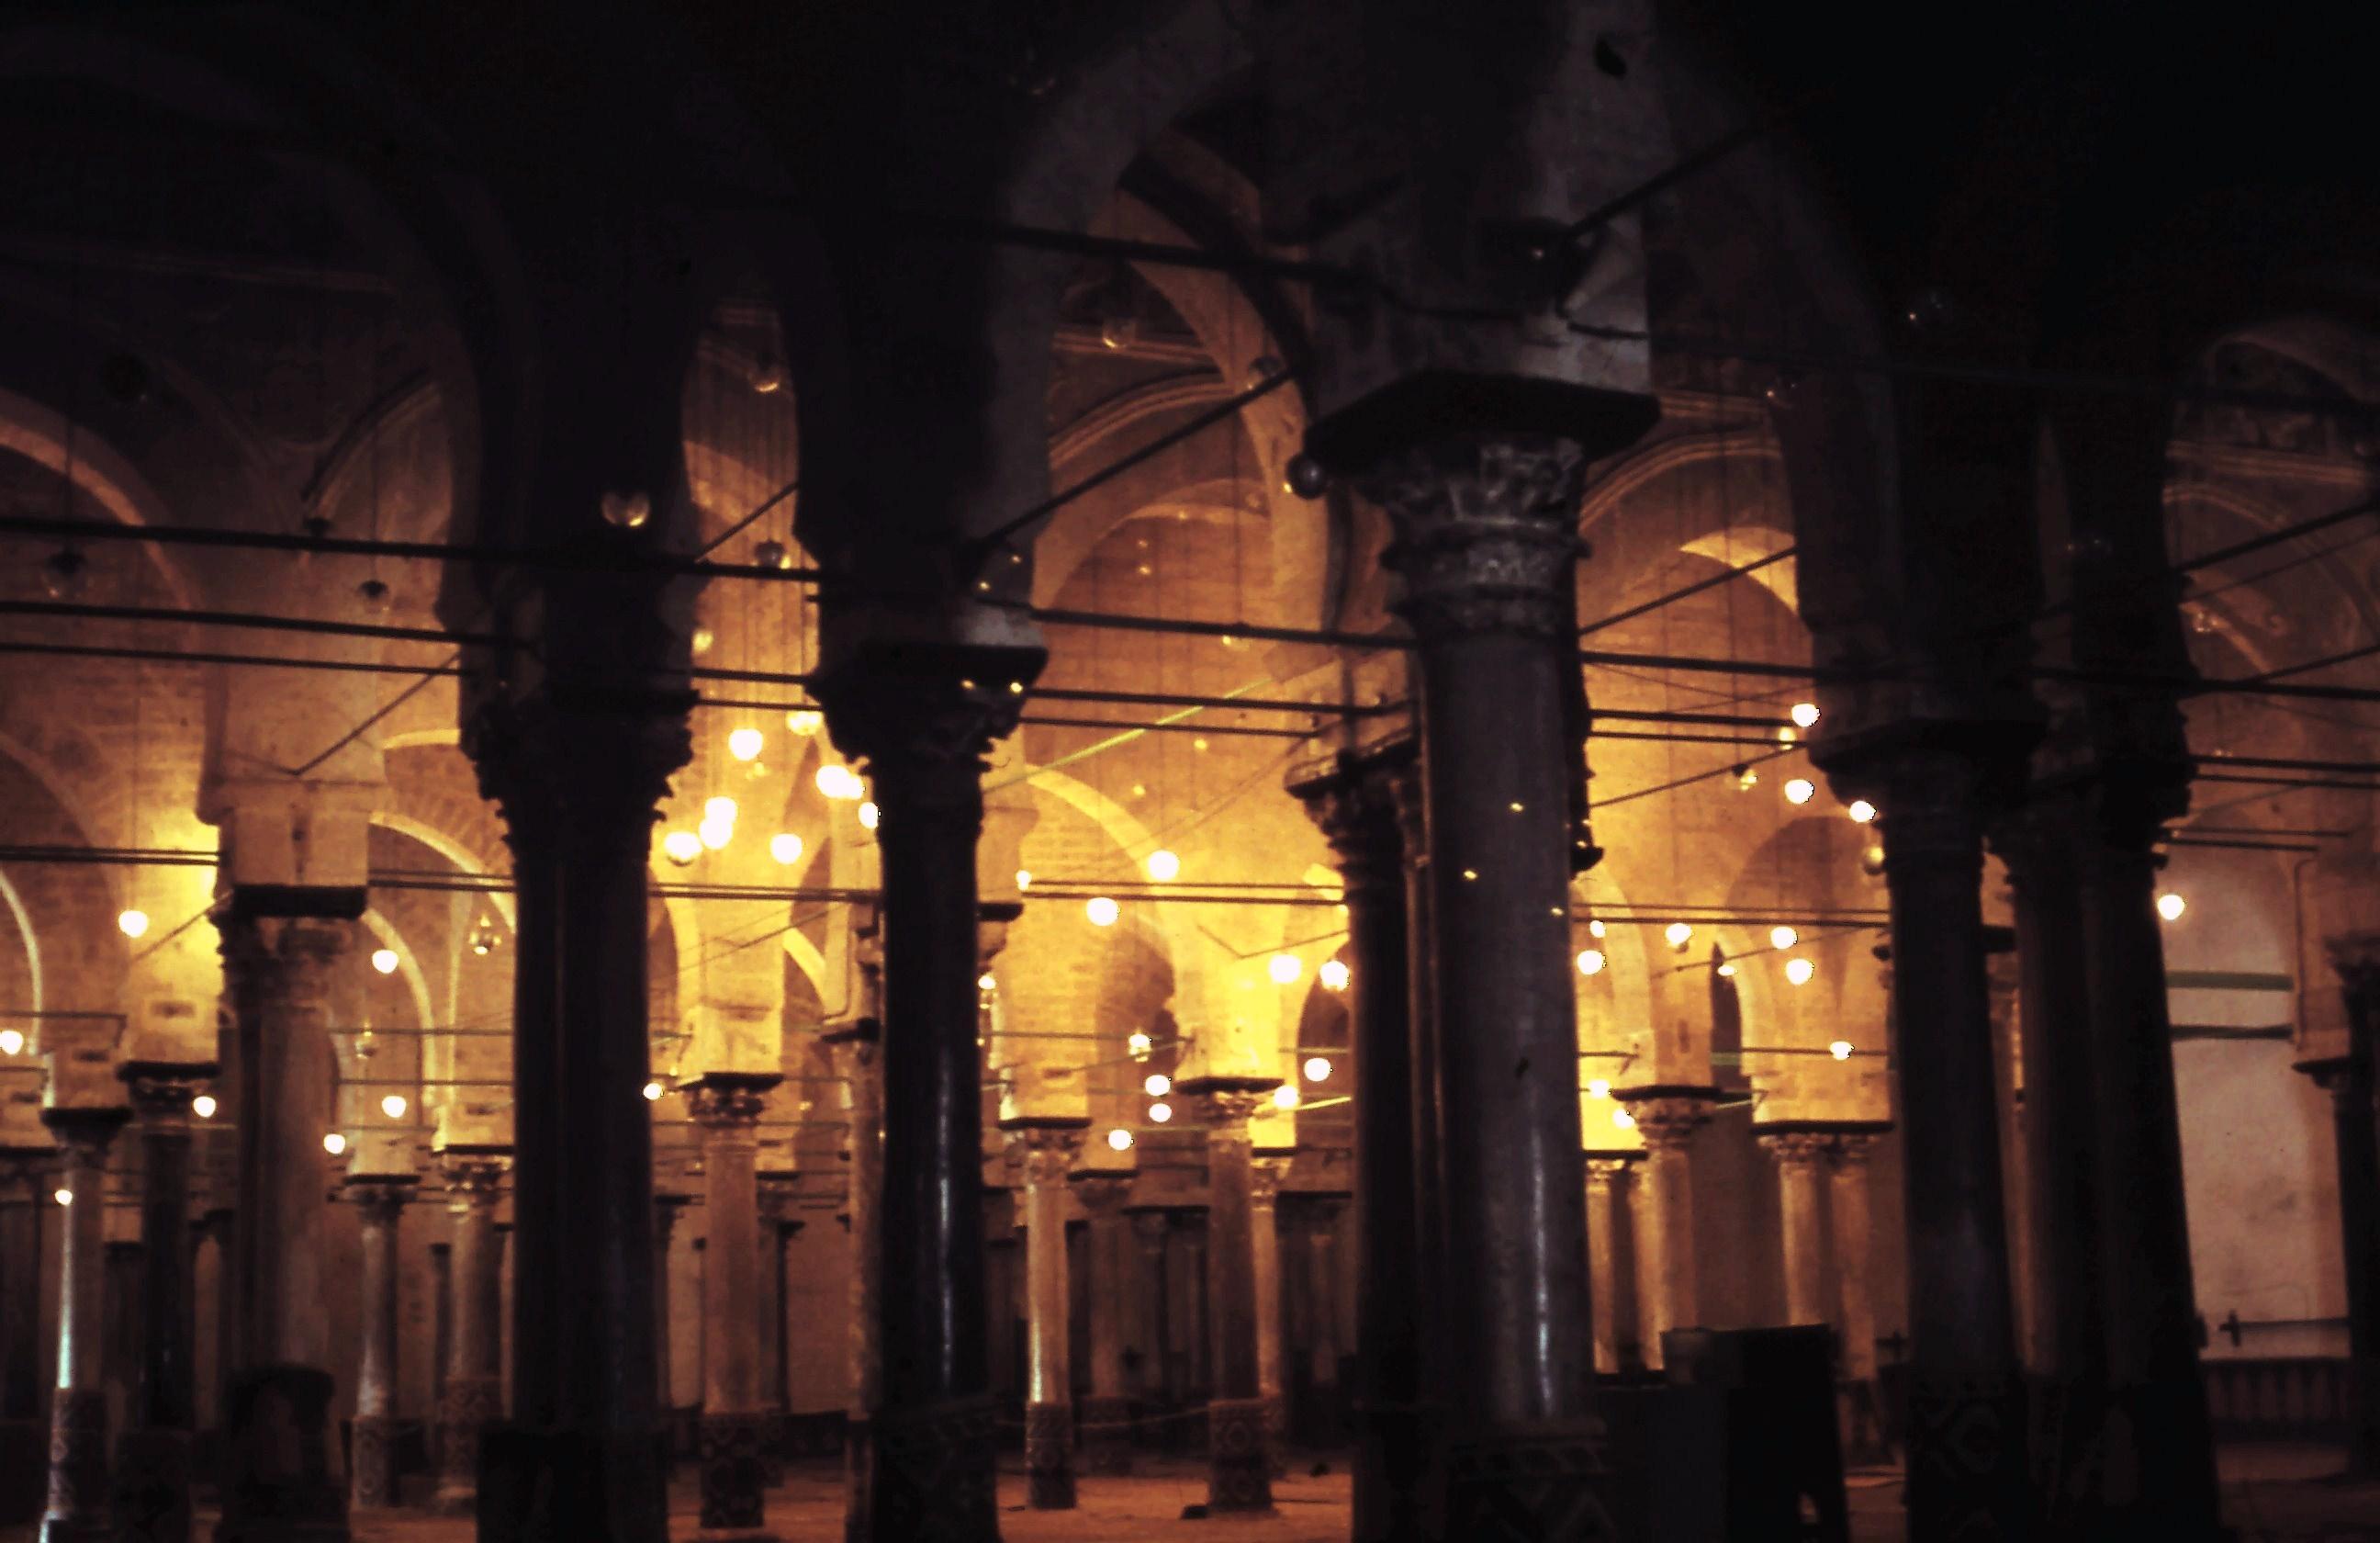 Mosque Kairouan File:kairouan Great Mosque